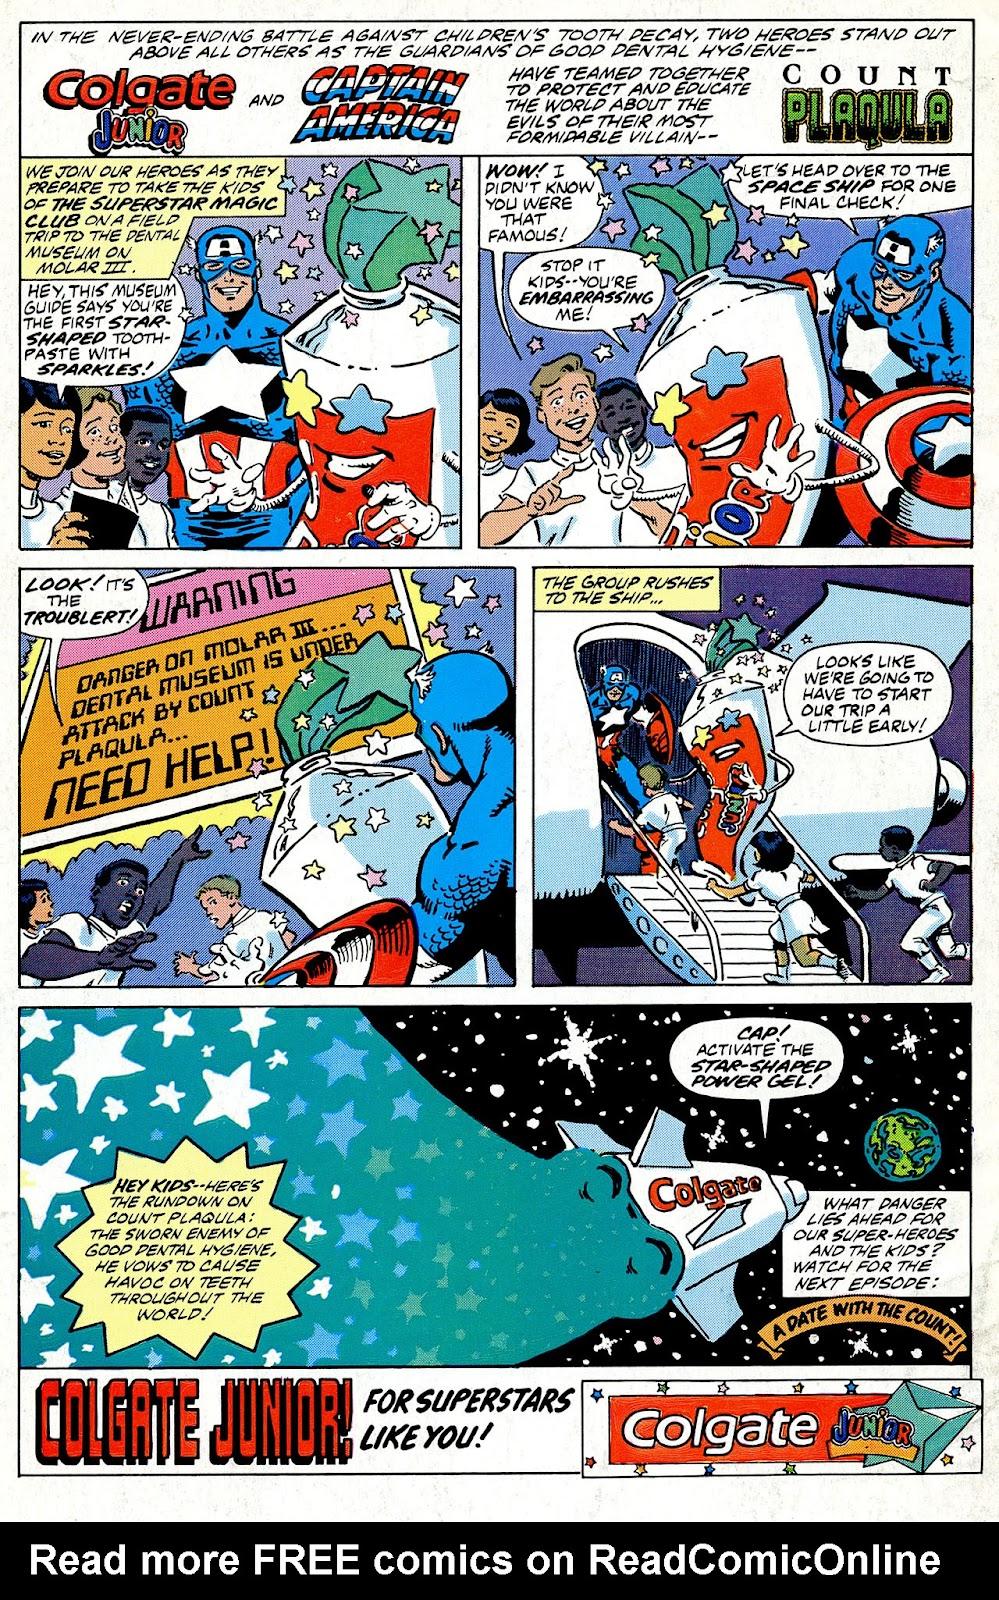 ALF 013 | Viewcomic reading comics online for free 2021